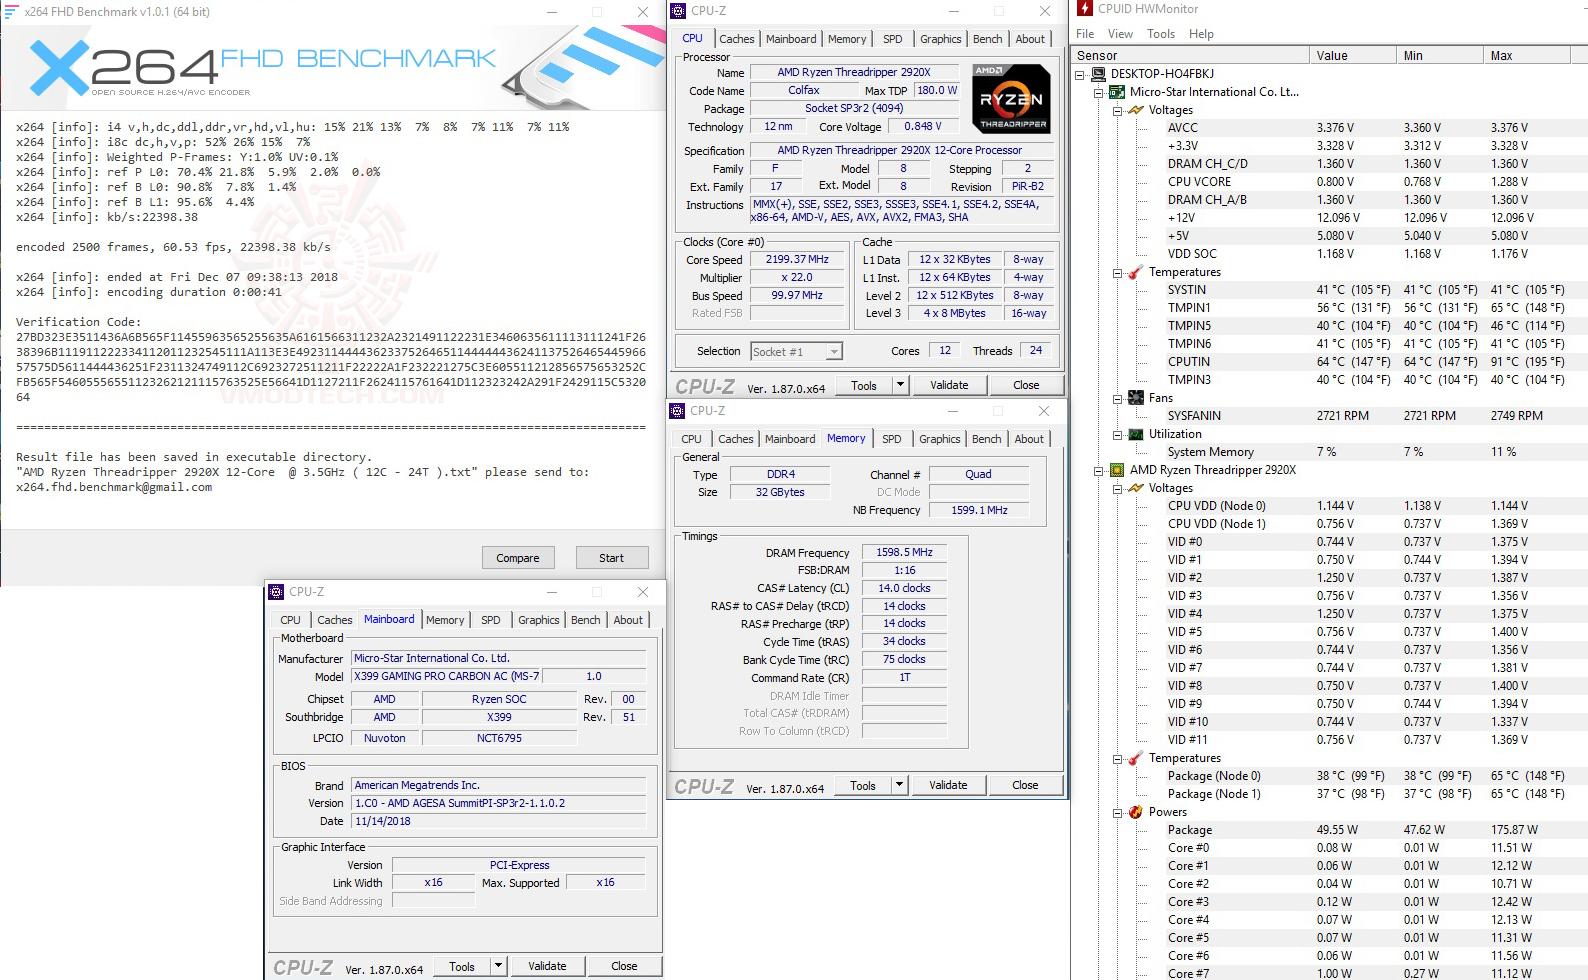 x264 1 AMD RYZEN THREADRIPPER 2920X PROCESSOR REVIEW